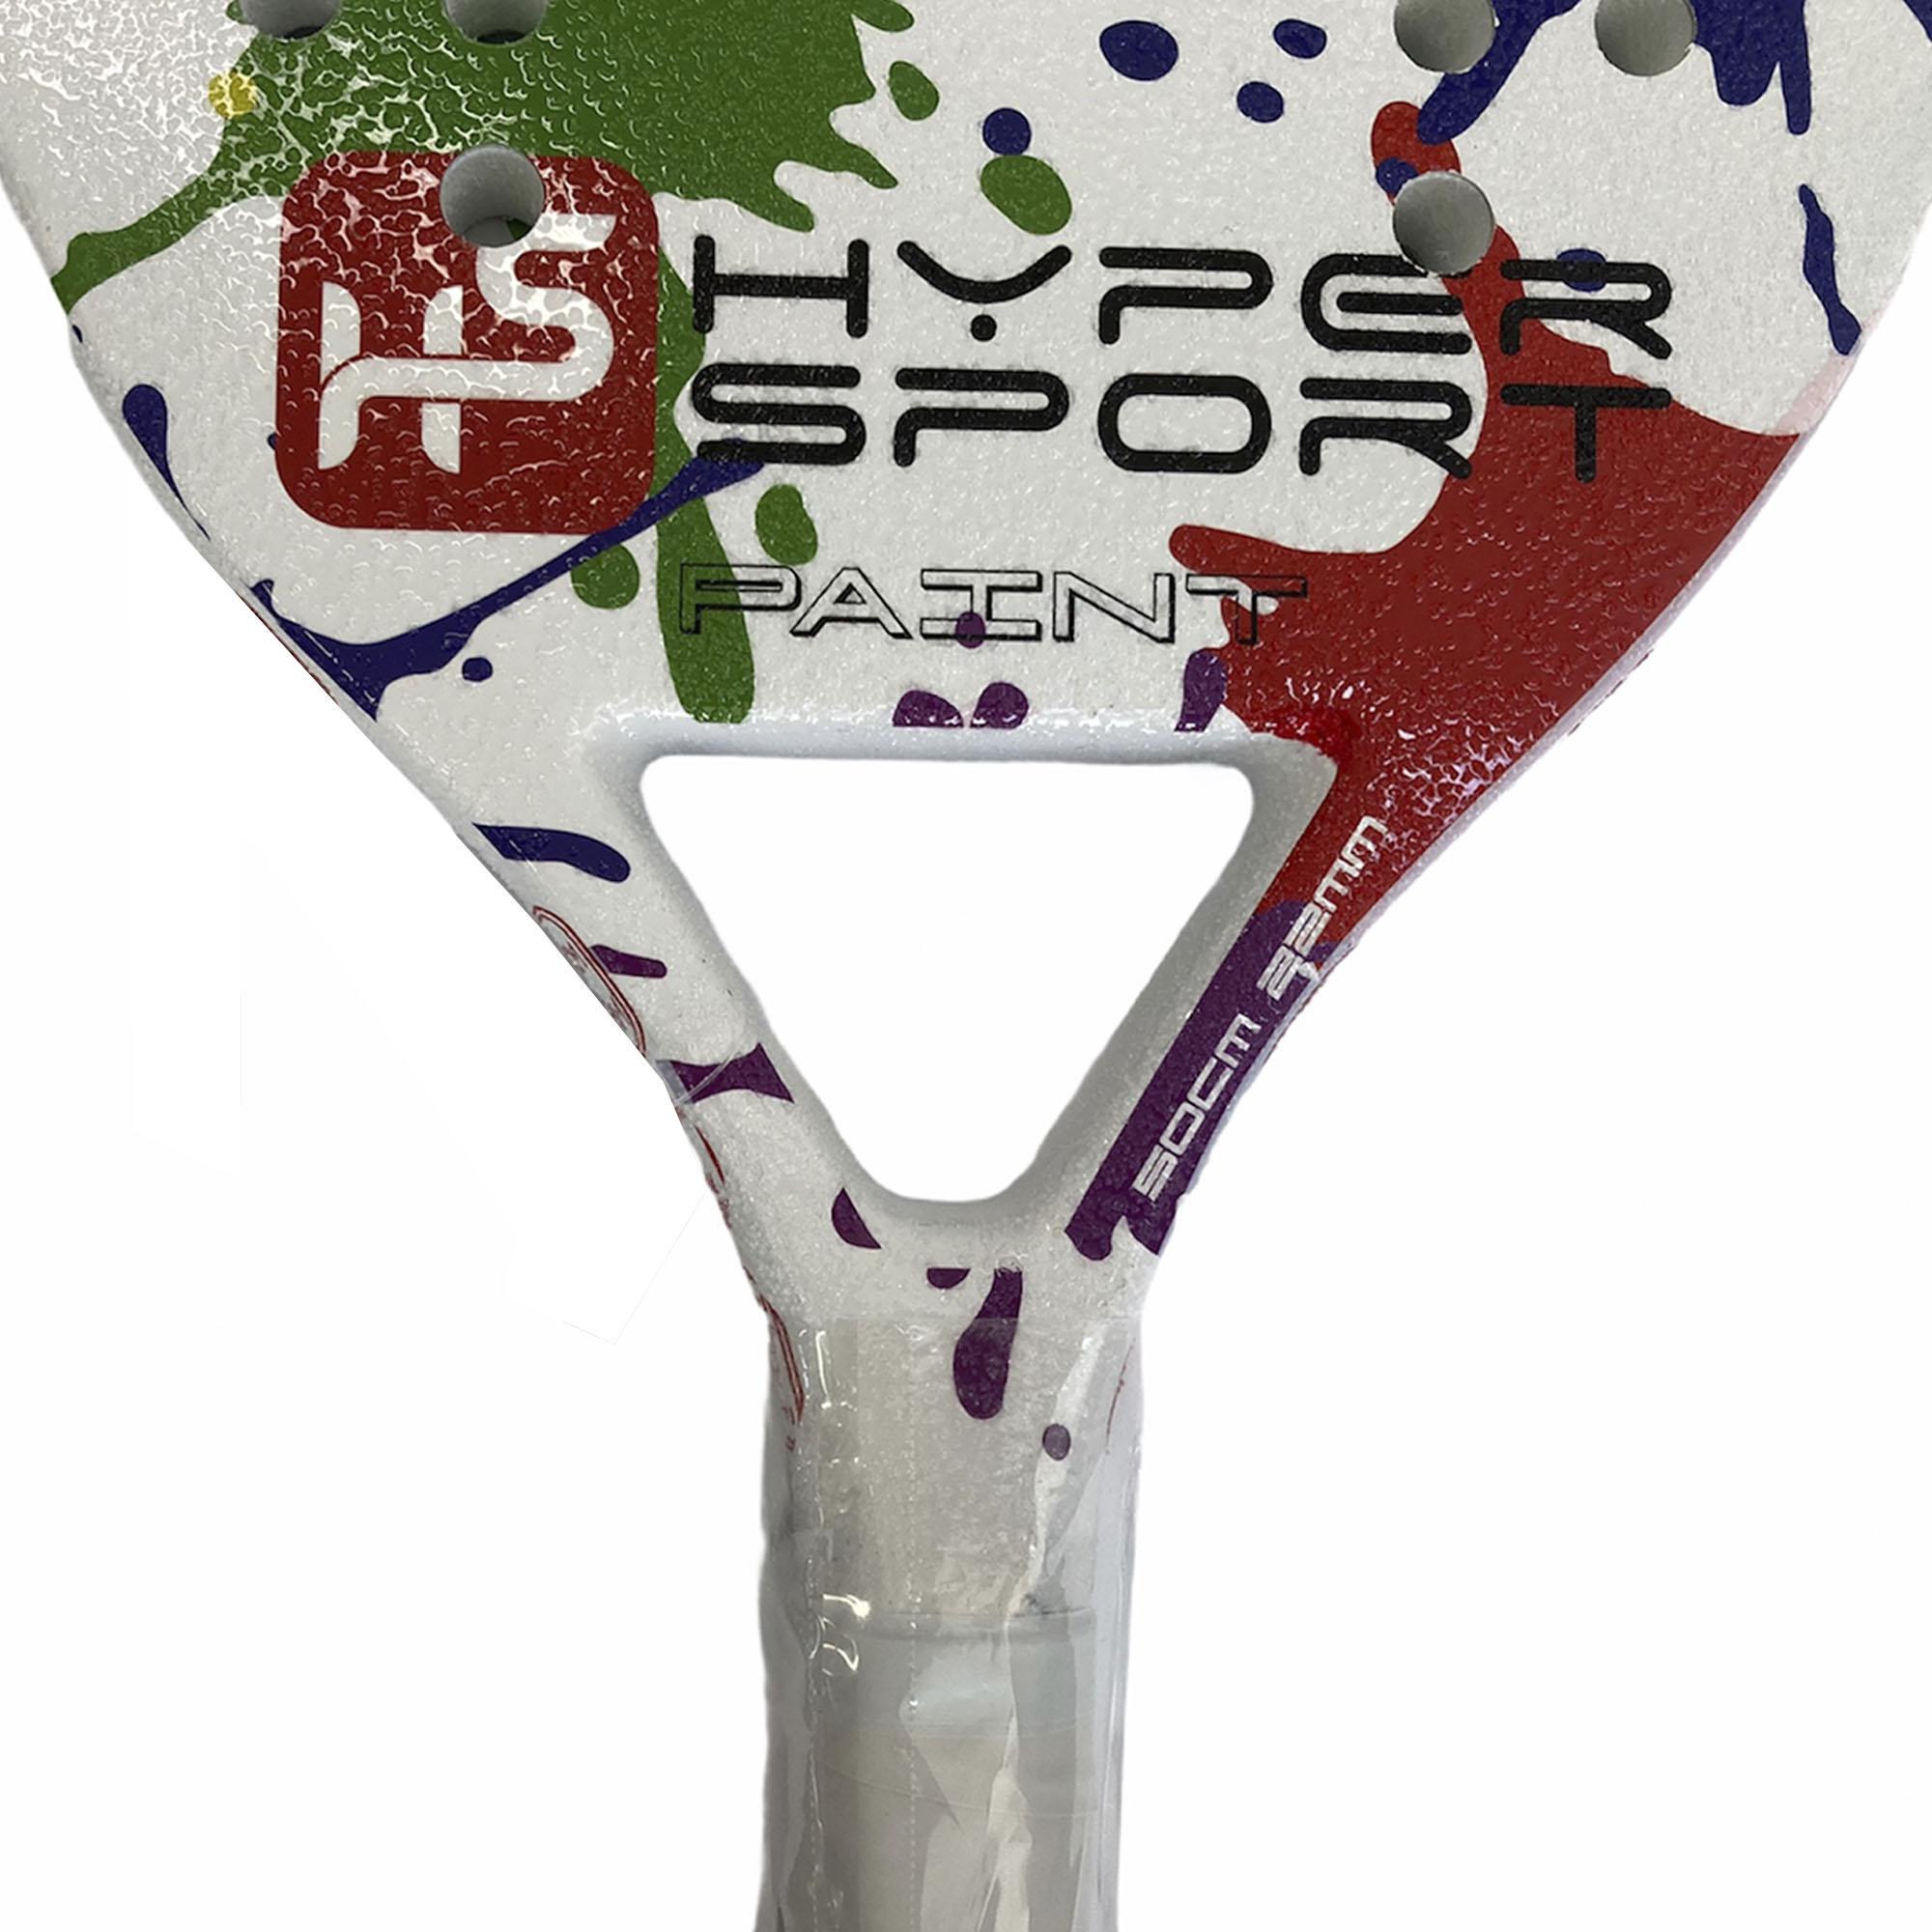 Raquete Beach Tennis Hyper Sports 2021- Paint